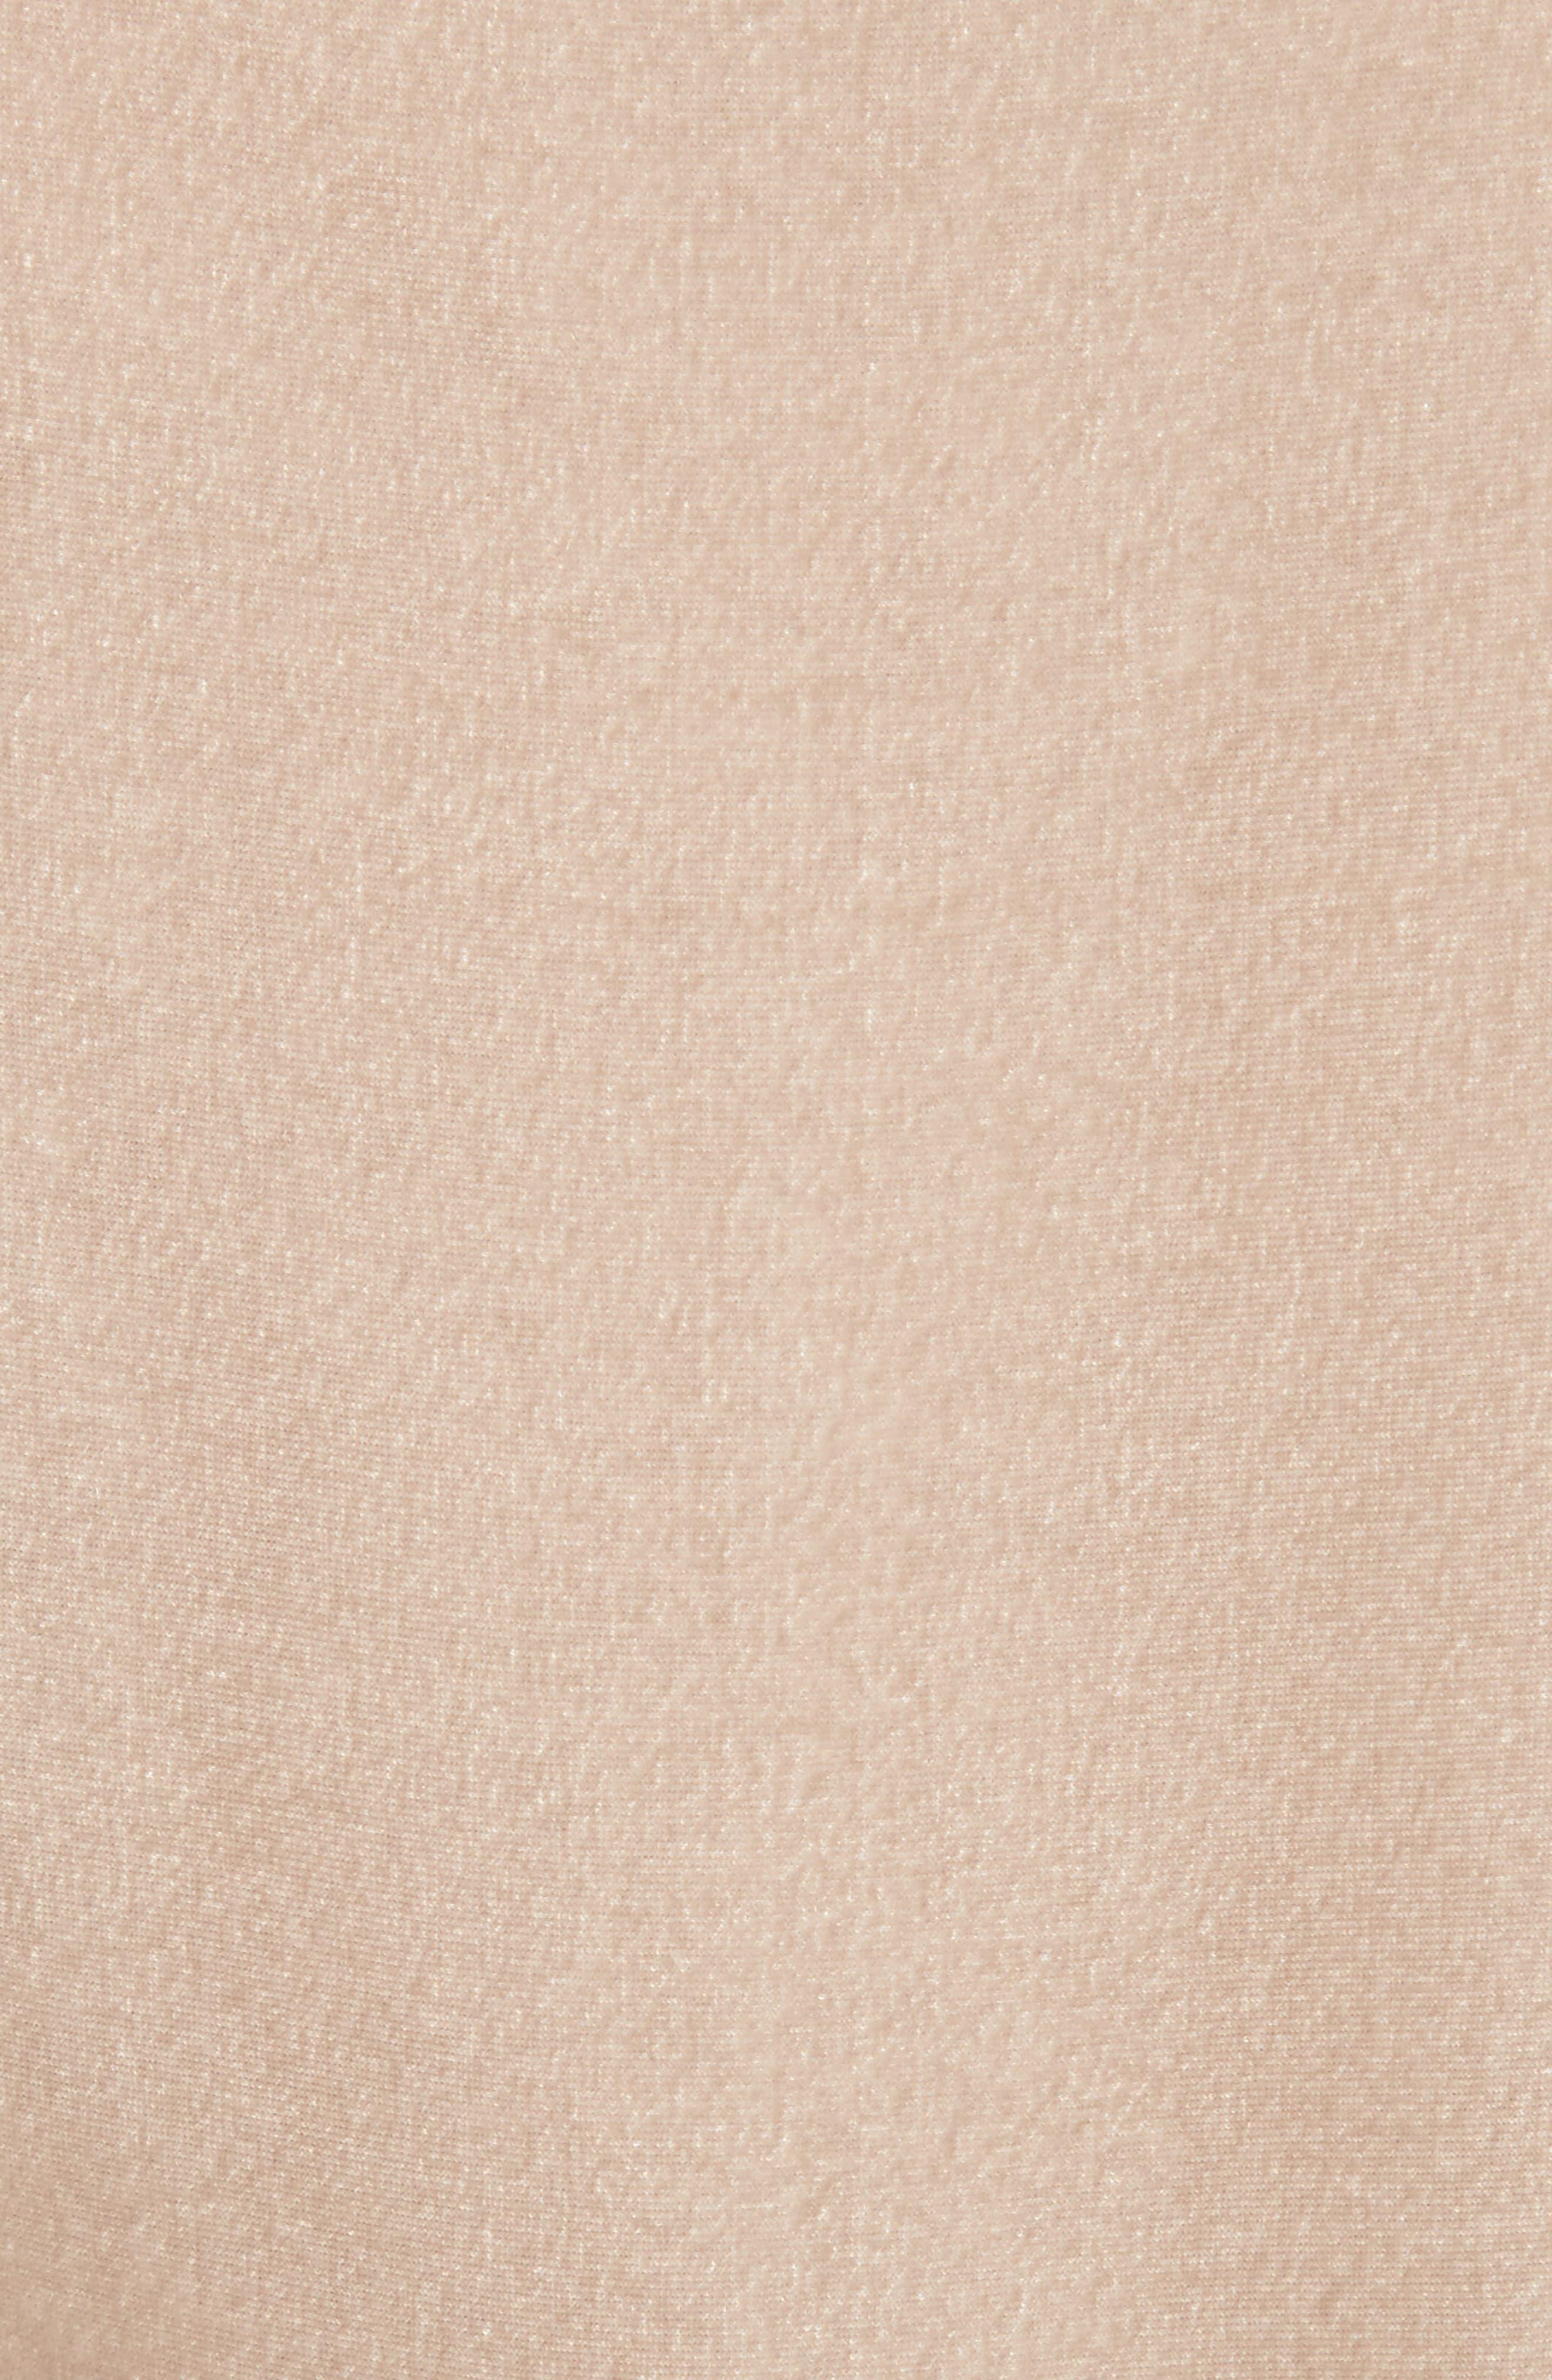 TIBI,                             Cold Shoulder Velvet Top,                             Alternate thumbnail 5, color,                             250